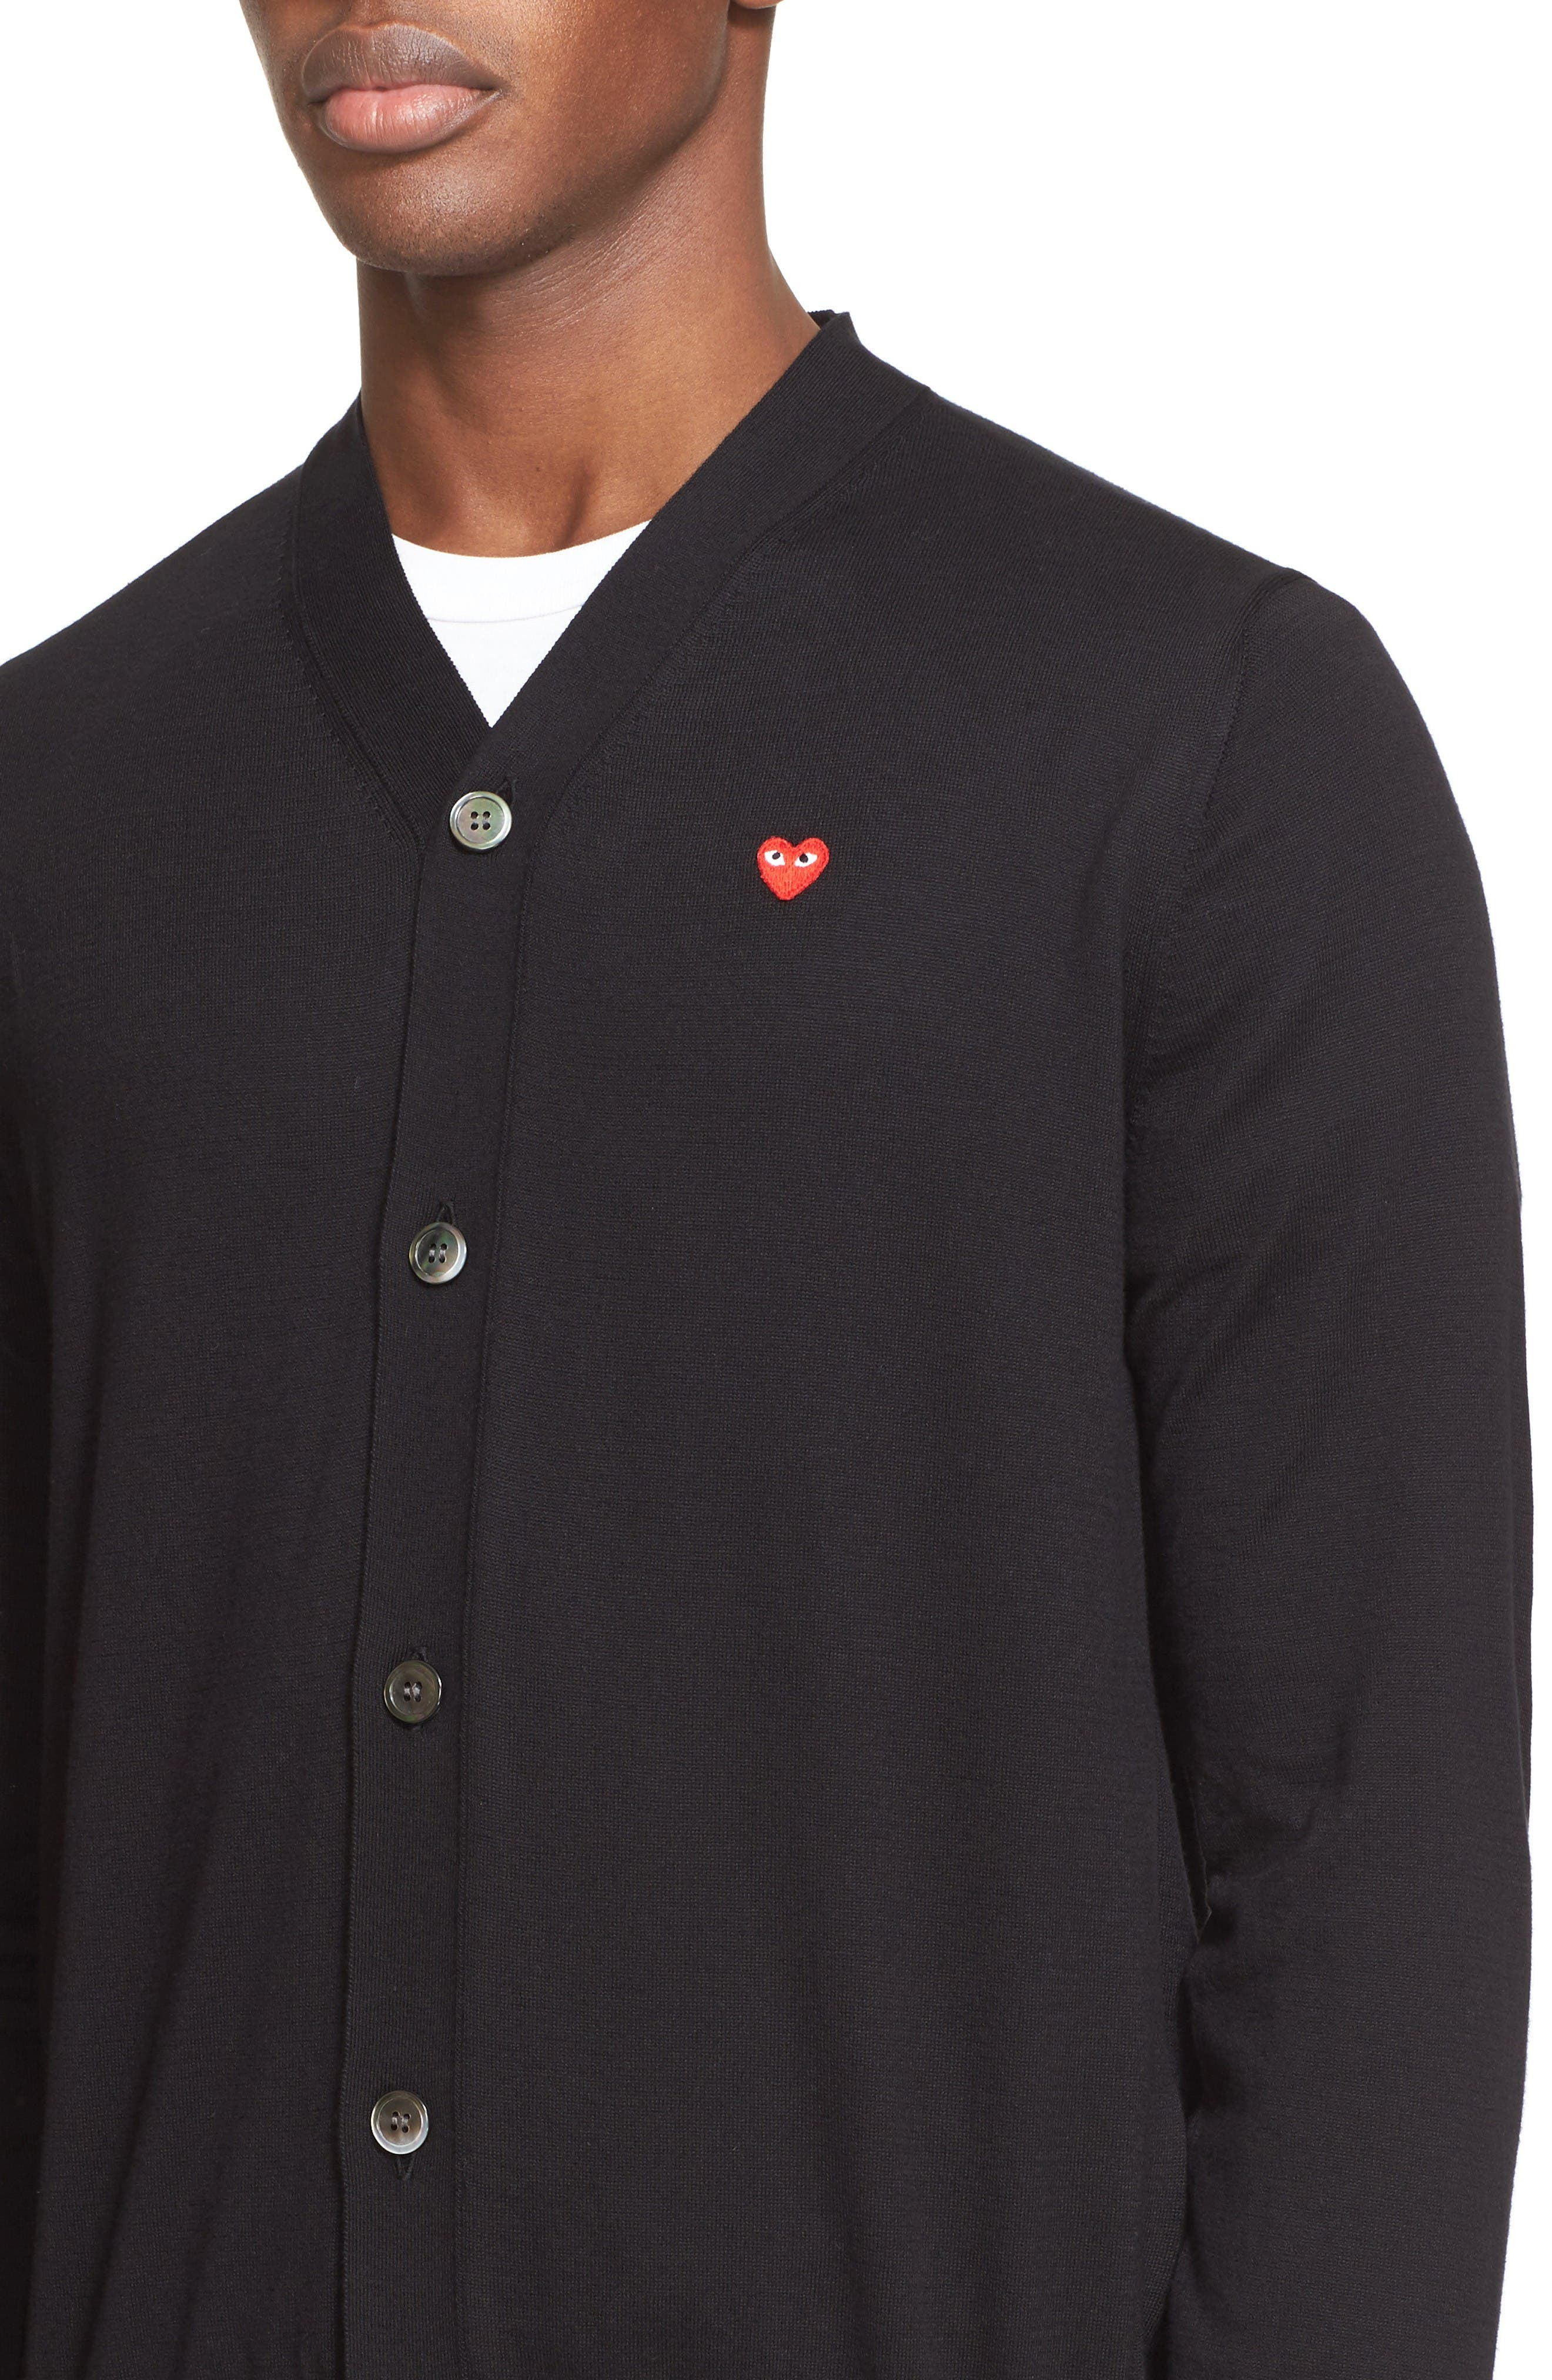 Comme des Garçons PLAY Heart Logo Cardigan,                             Alternate thumbnail 4, color,                             Black